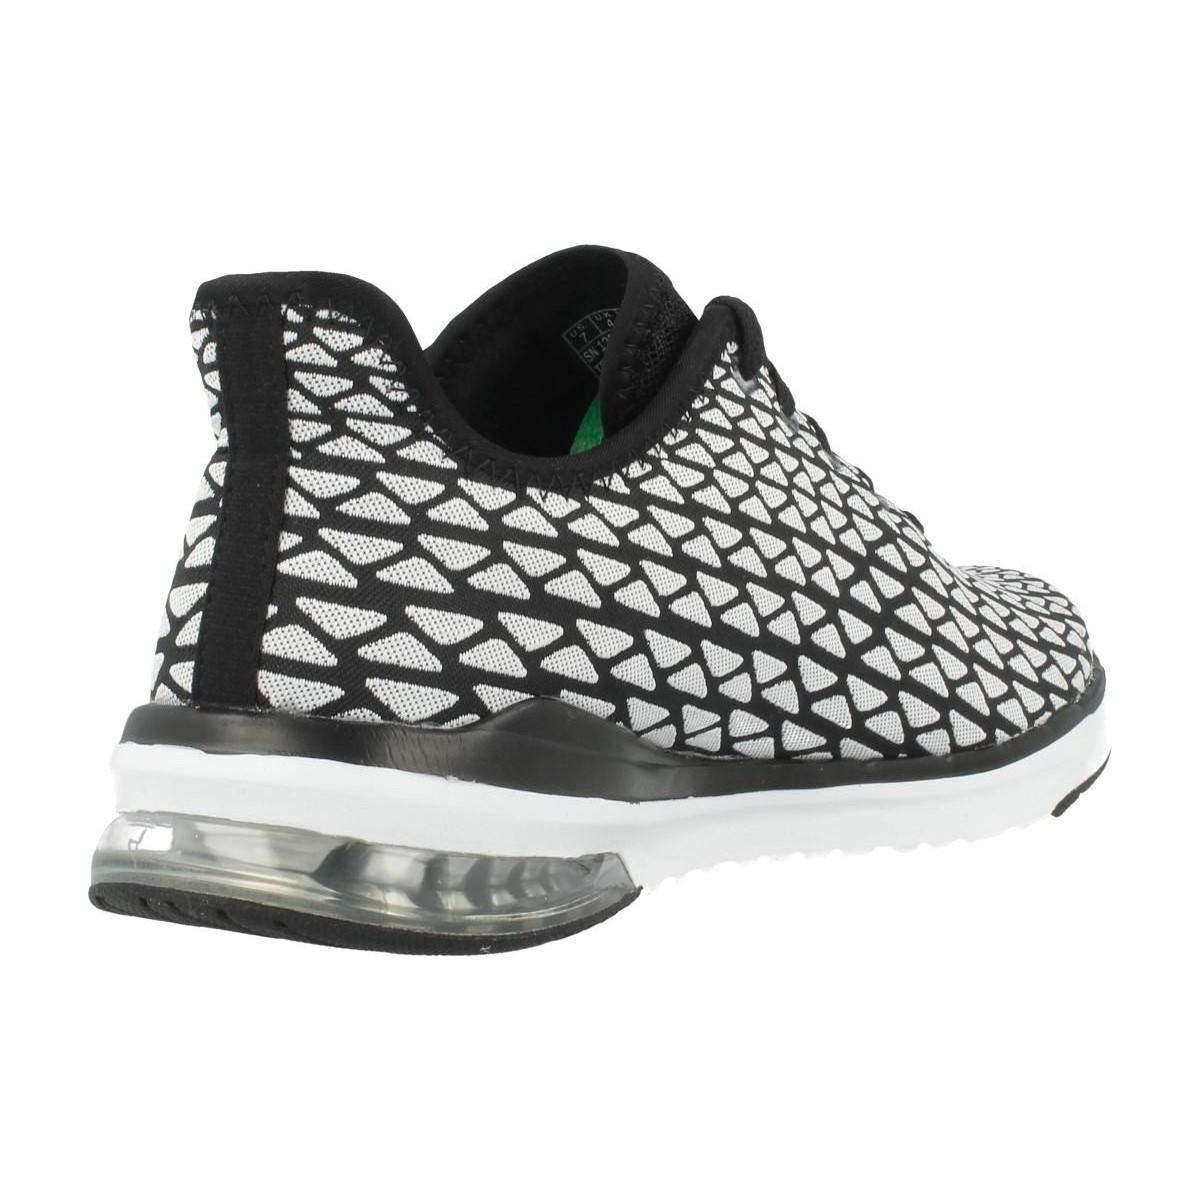 Skechers Skech Air Infinity Women's Shoes (trainers) In Black